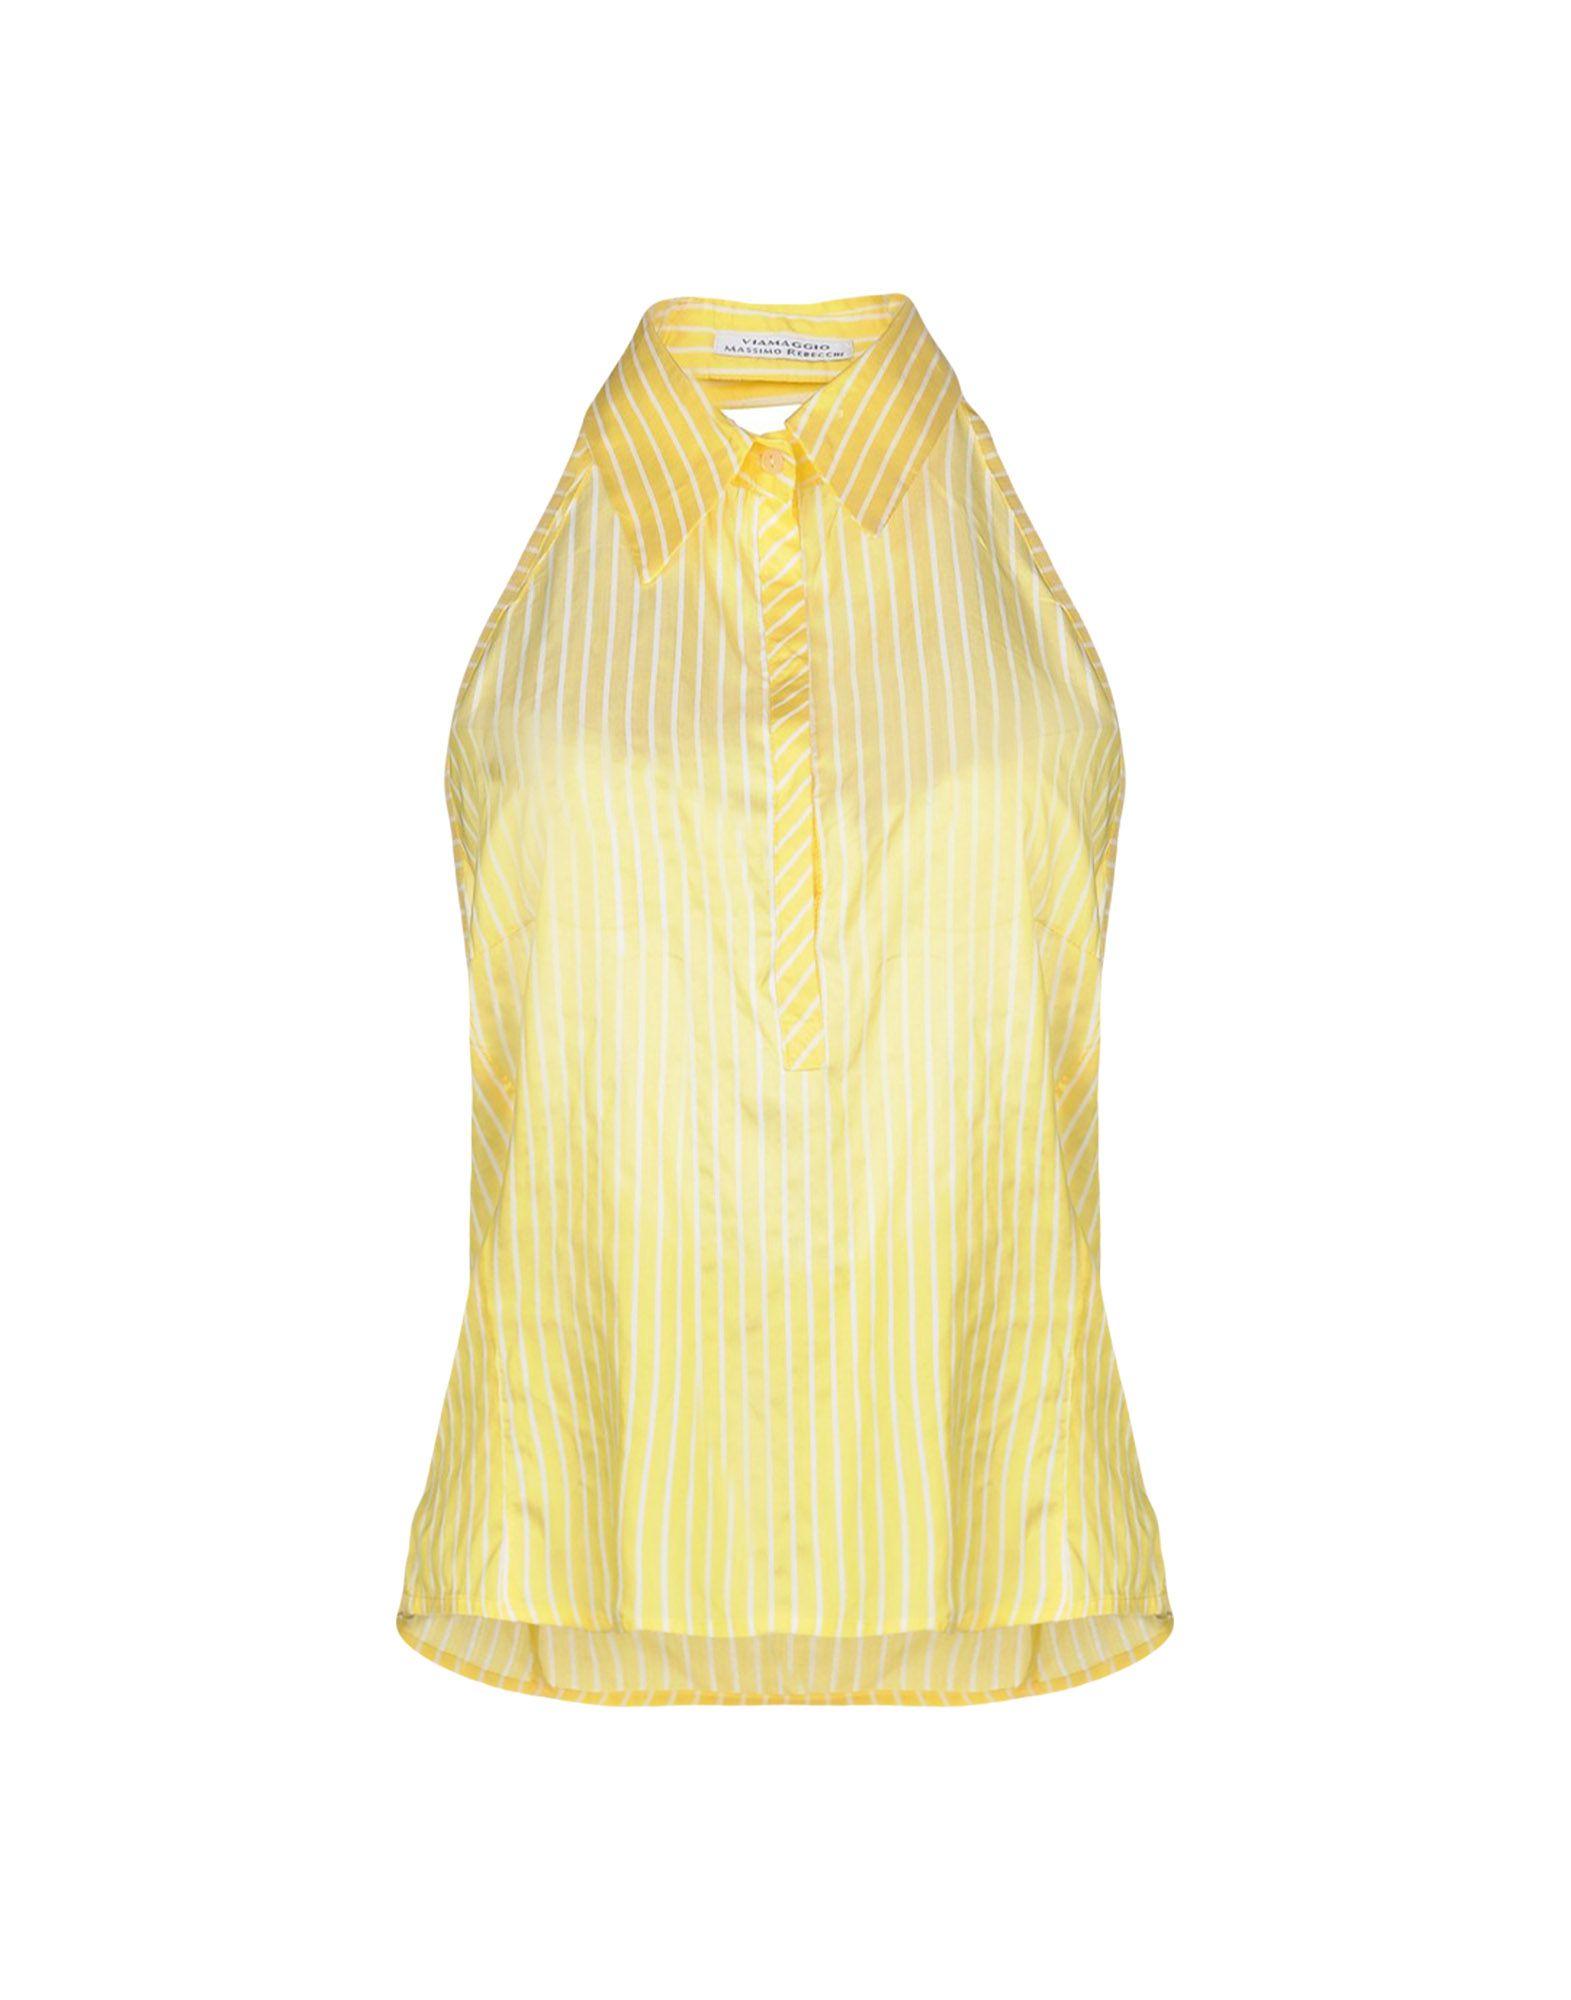 VIAMAGGIO MASSIMO REBECCHI Топ без рукавов viamaggio massimo rebecchi платье длиной 3 4